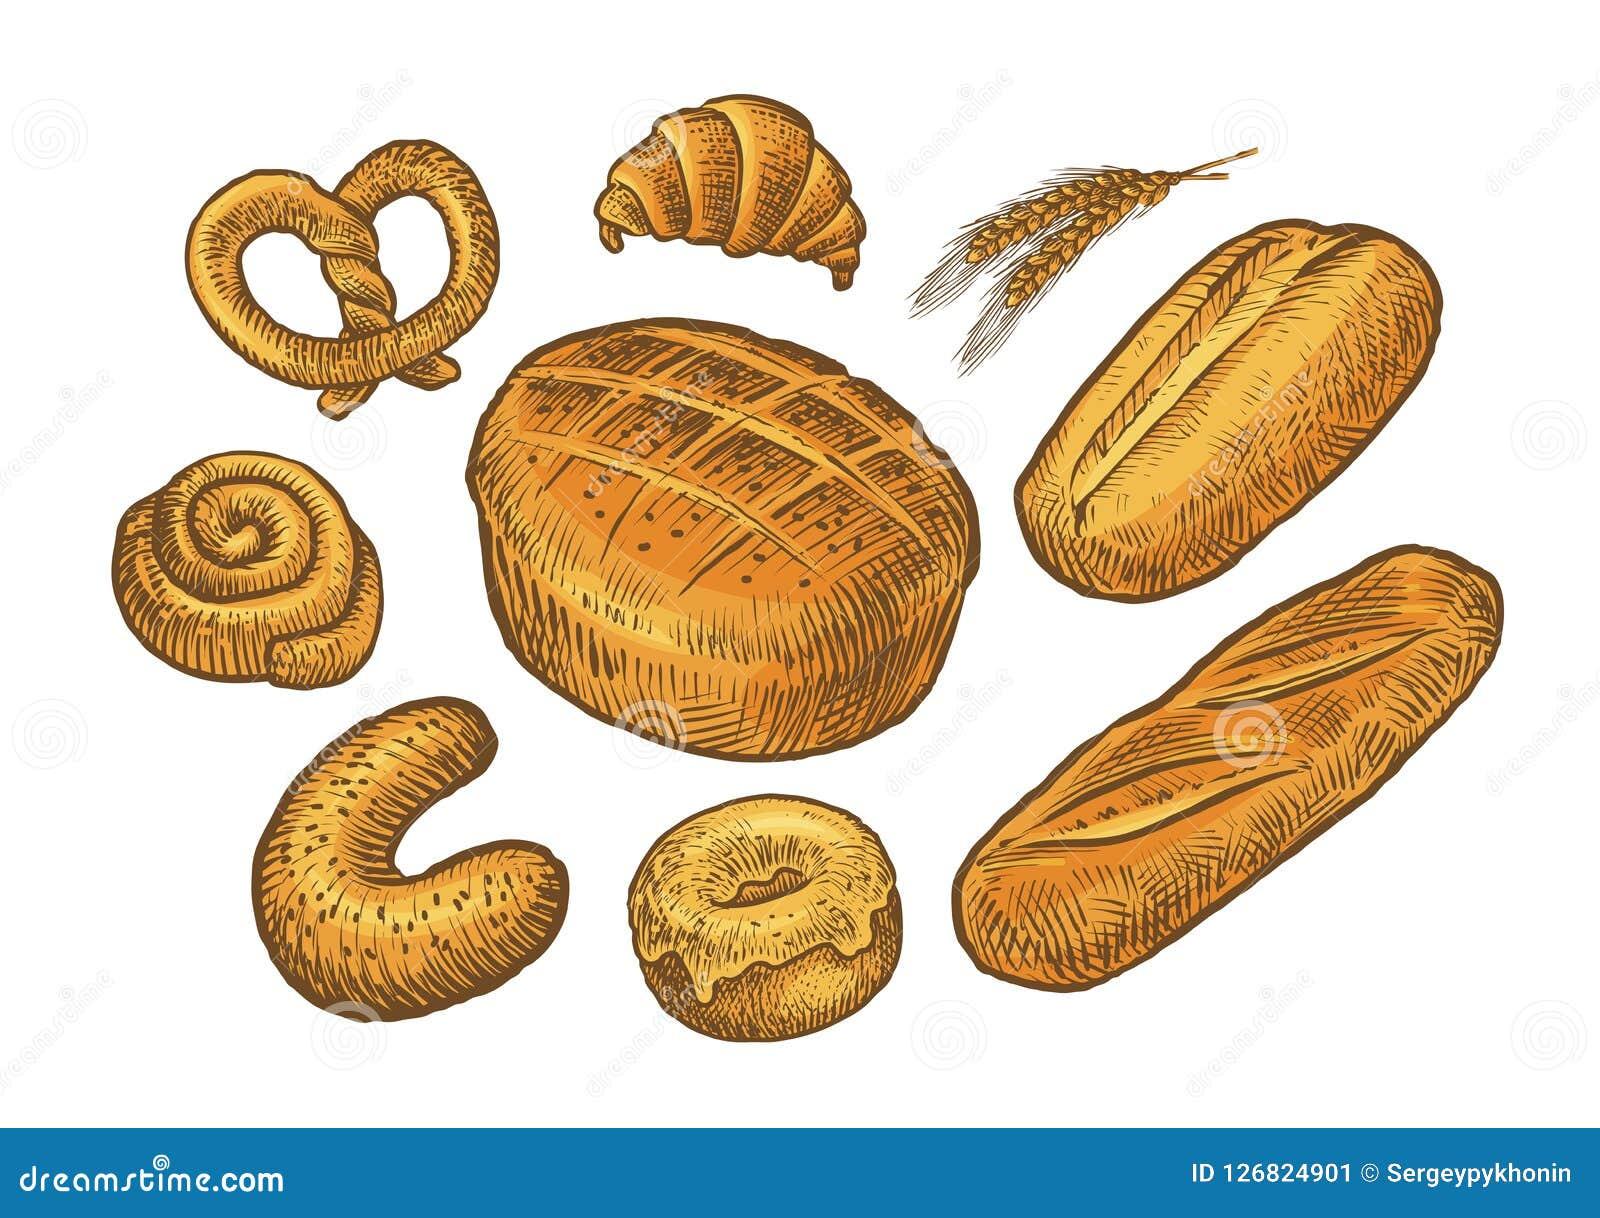 Bread, baked goods sketch. Bakery, bakeshop, food concept. Vintage vector